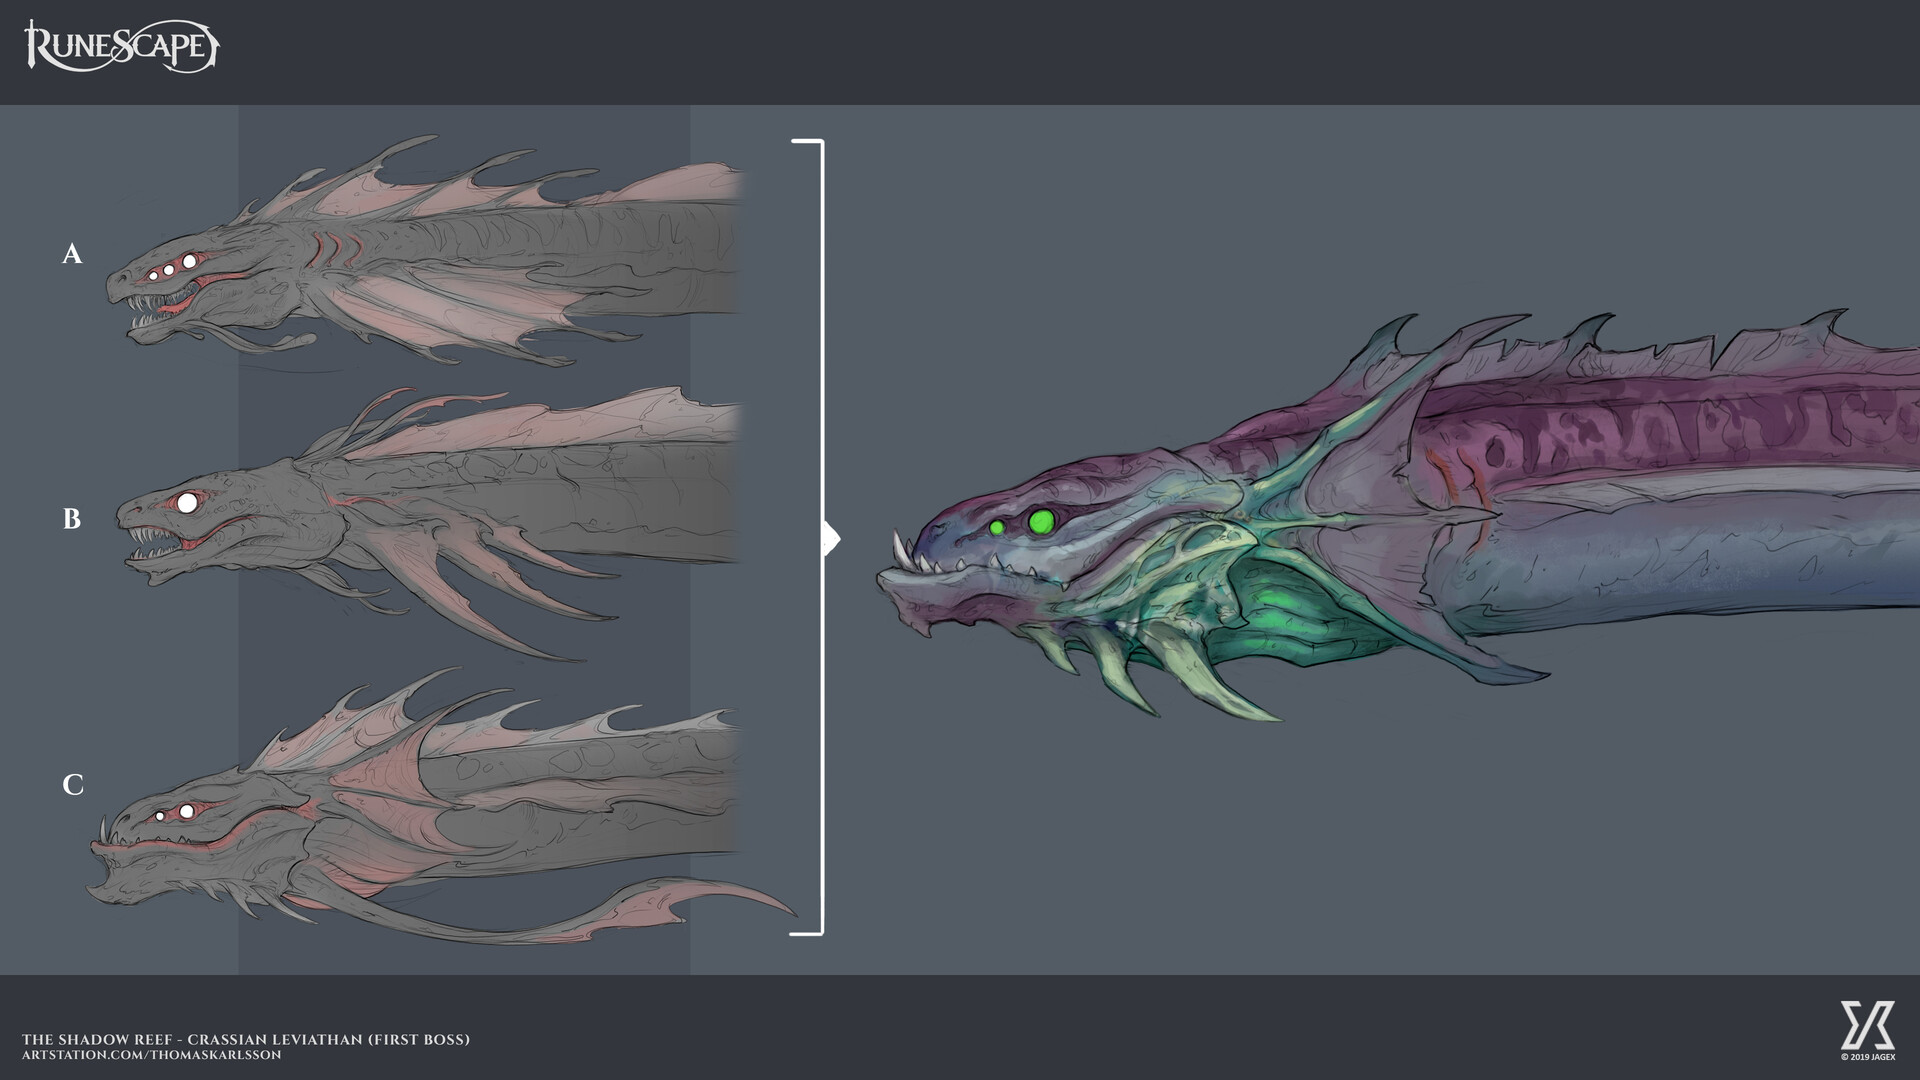 ArtStation - RuneScape - Crassian Leviathan, Thomas Karlsson